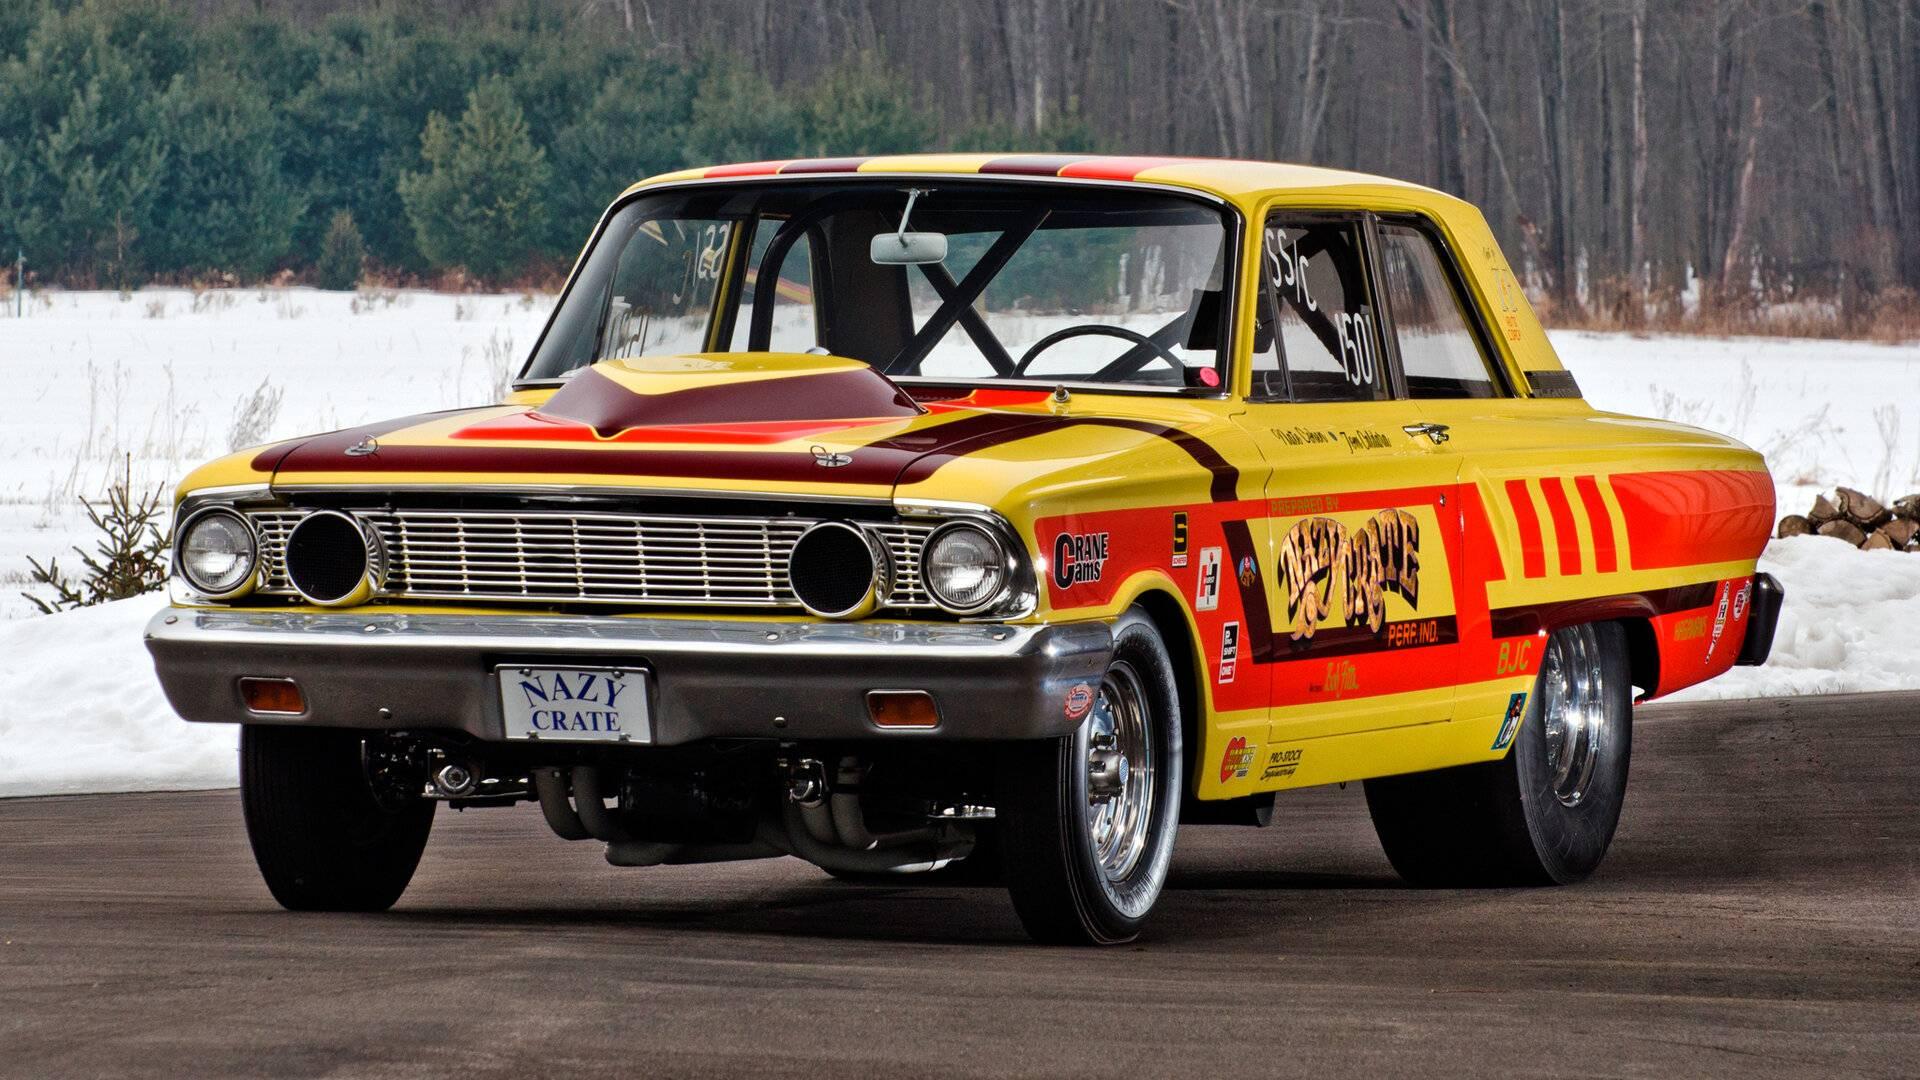 Coche del día: 1964 Ford Fairlane Thunderbolt